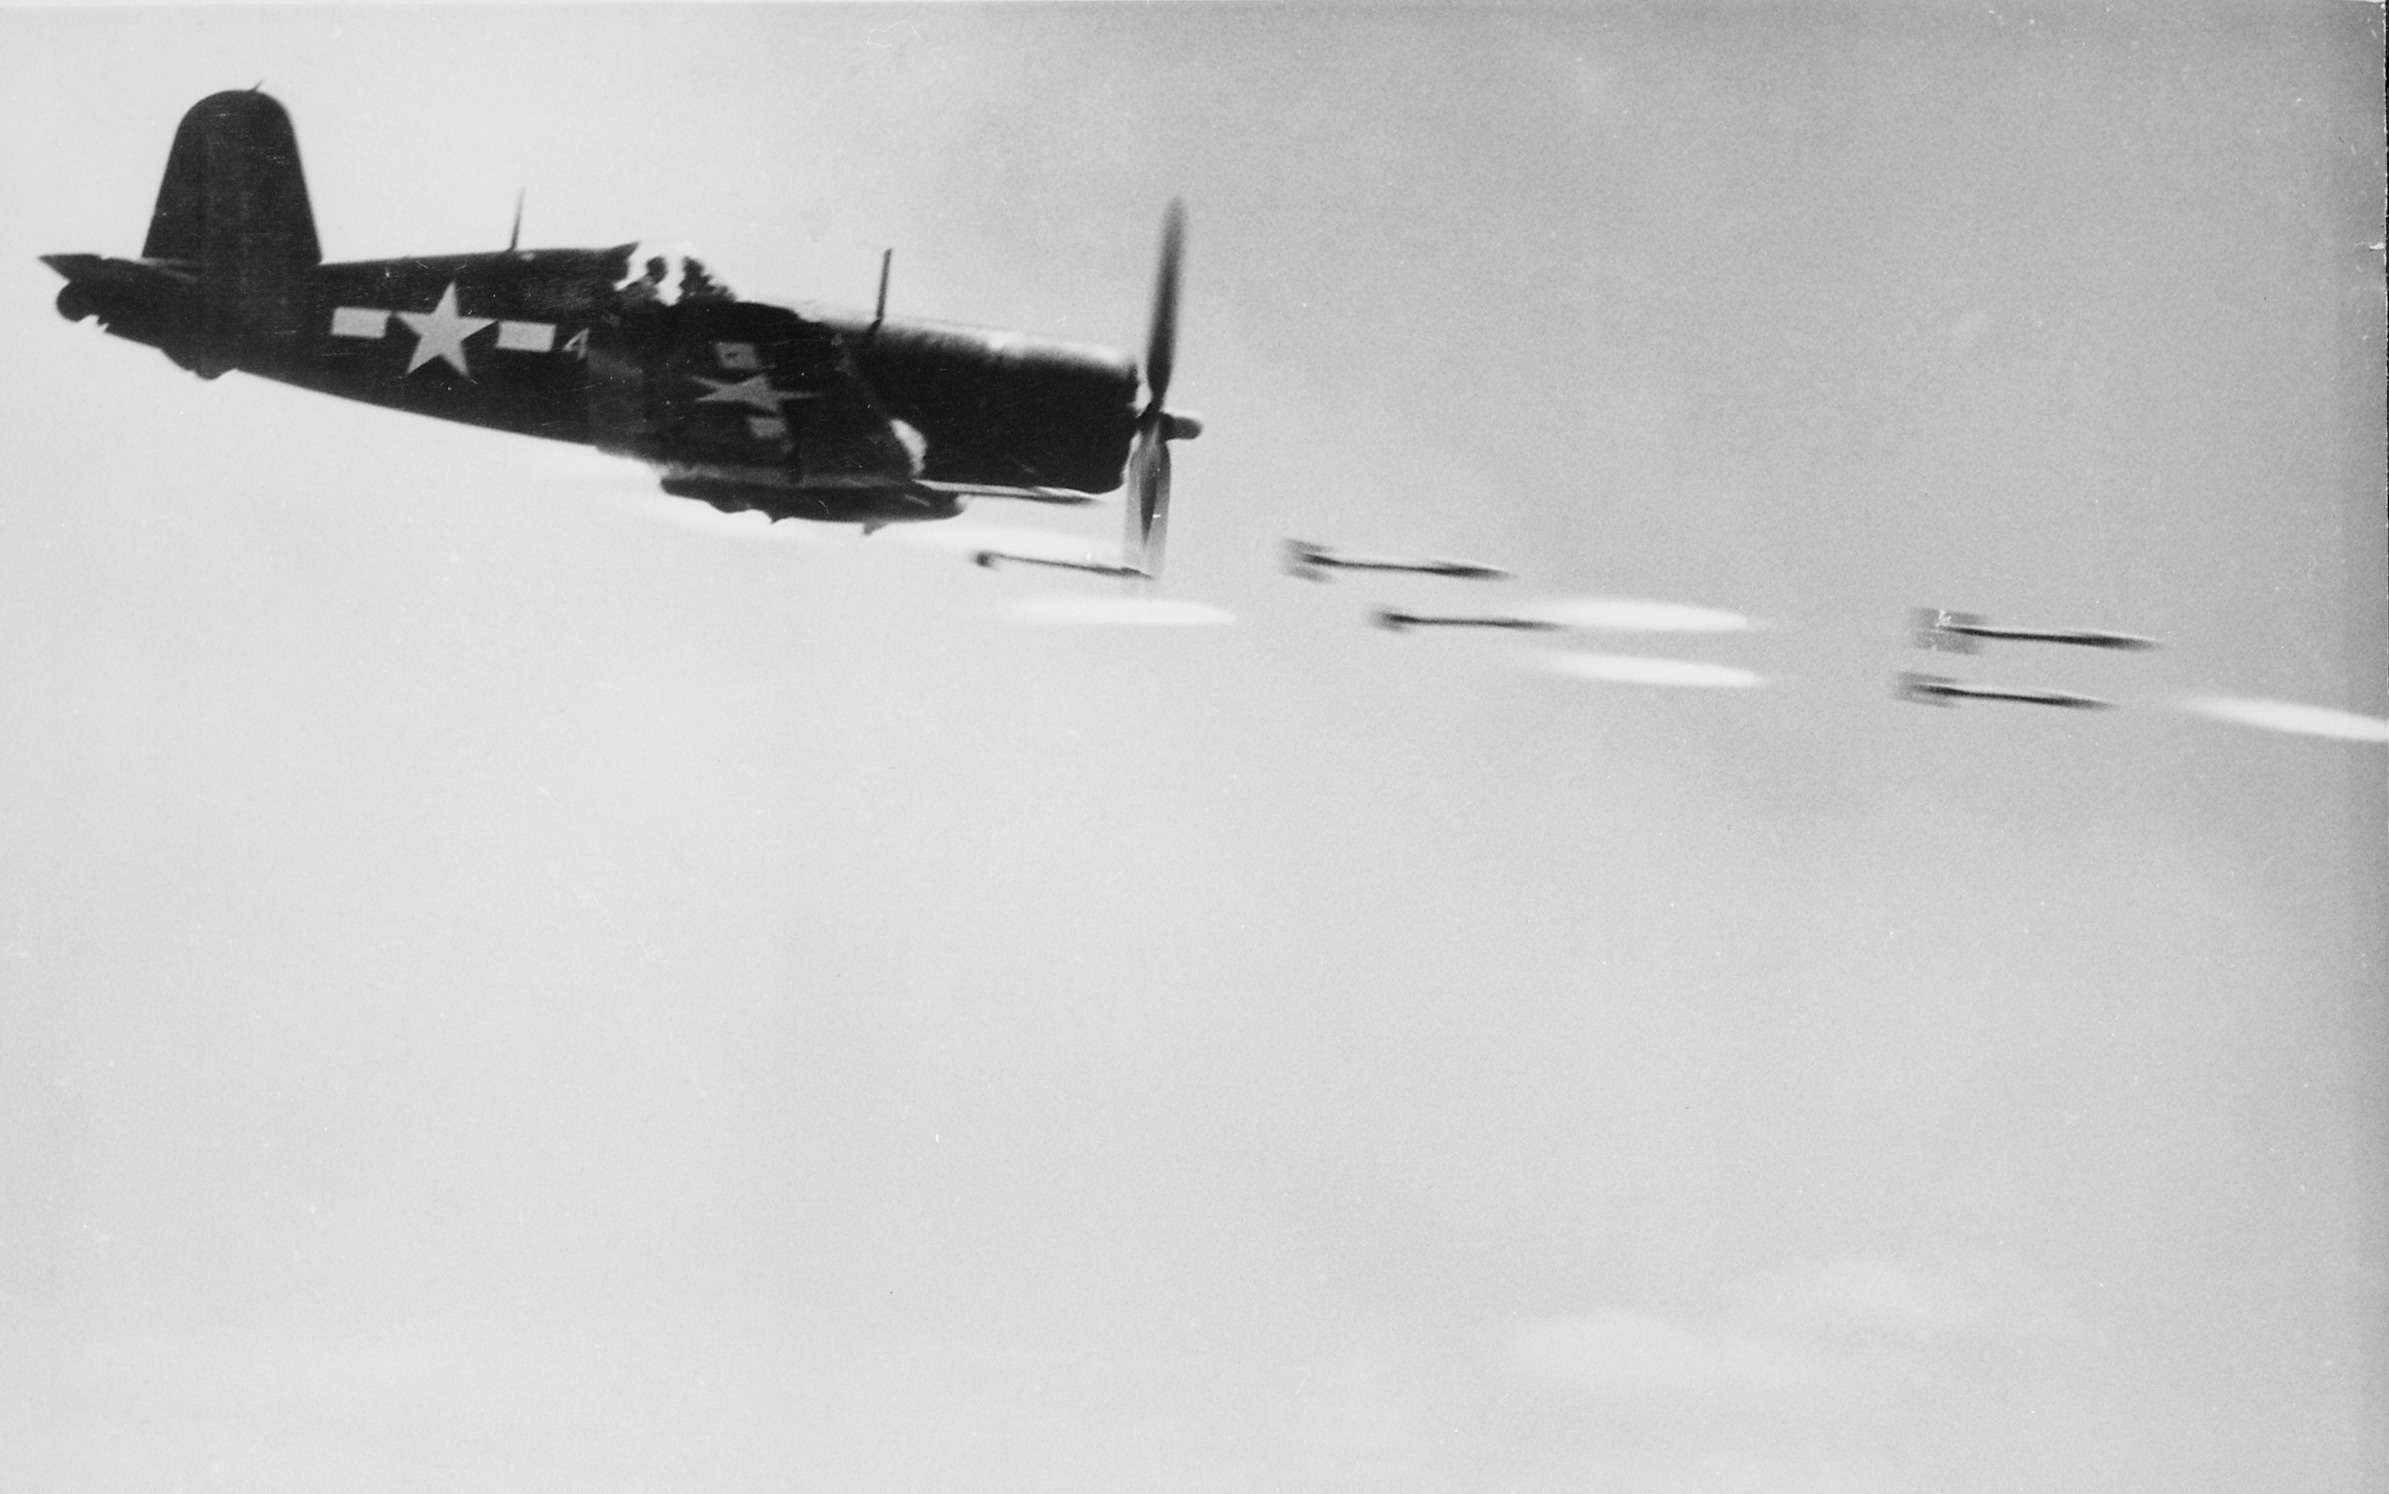 F4U Corsair fighter firing rockets during the Battle of Okinawa.